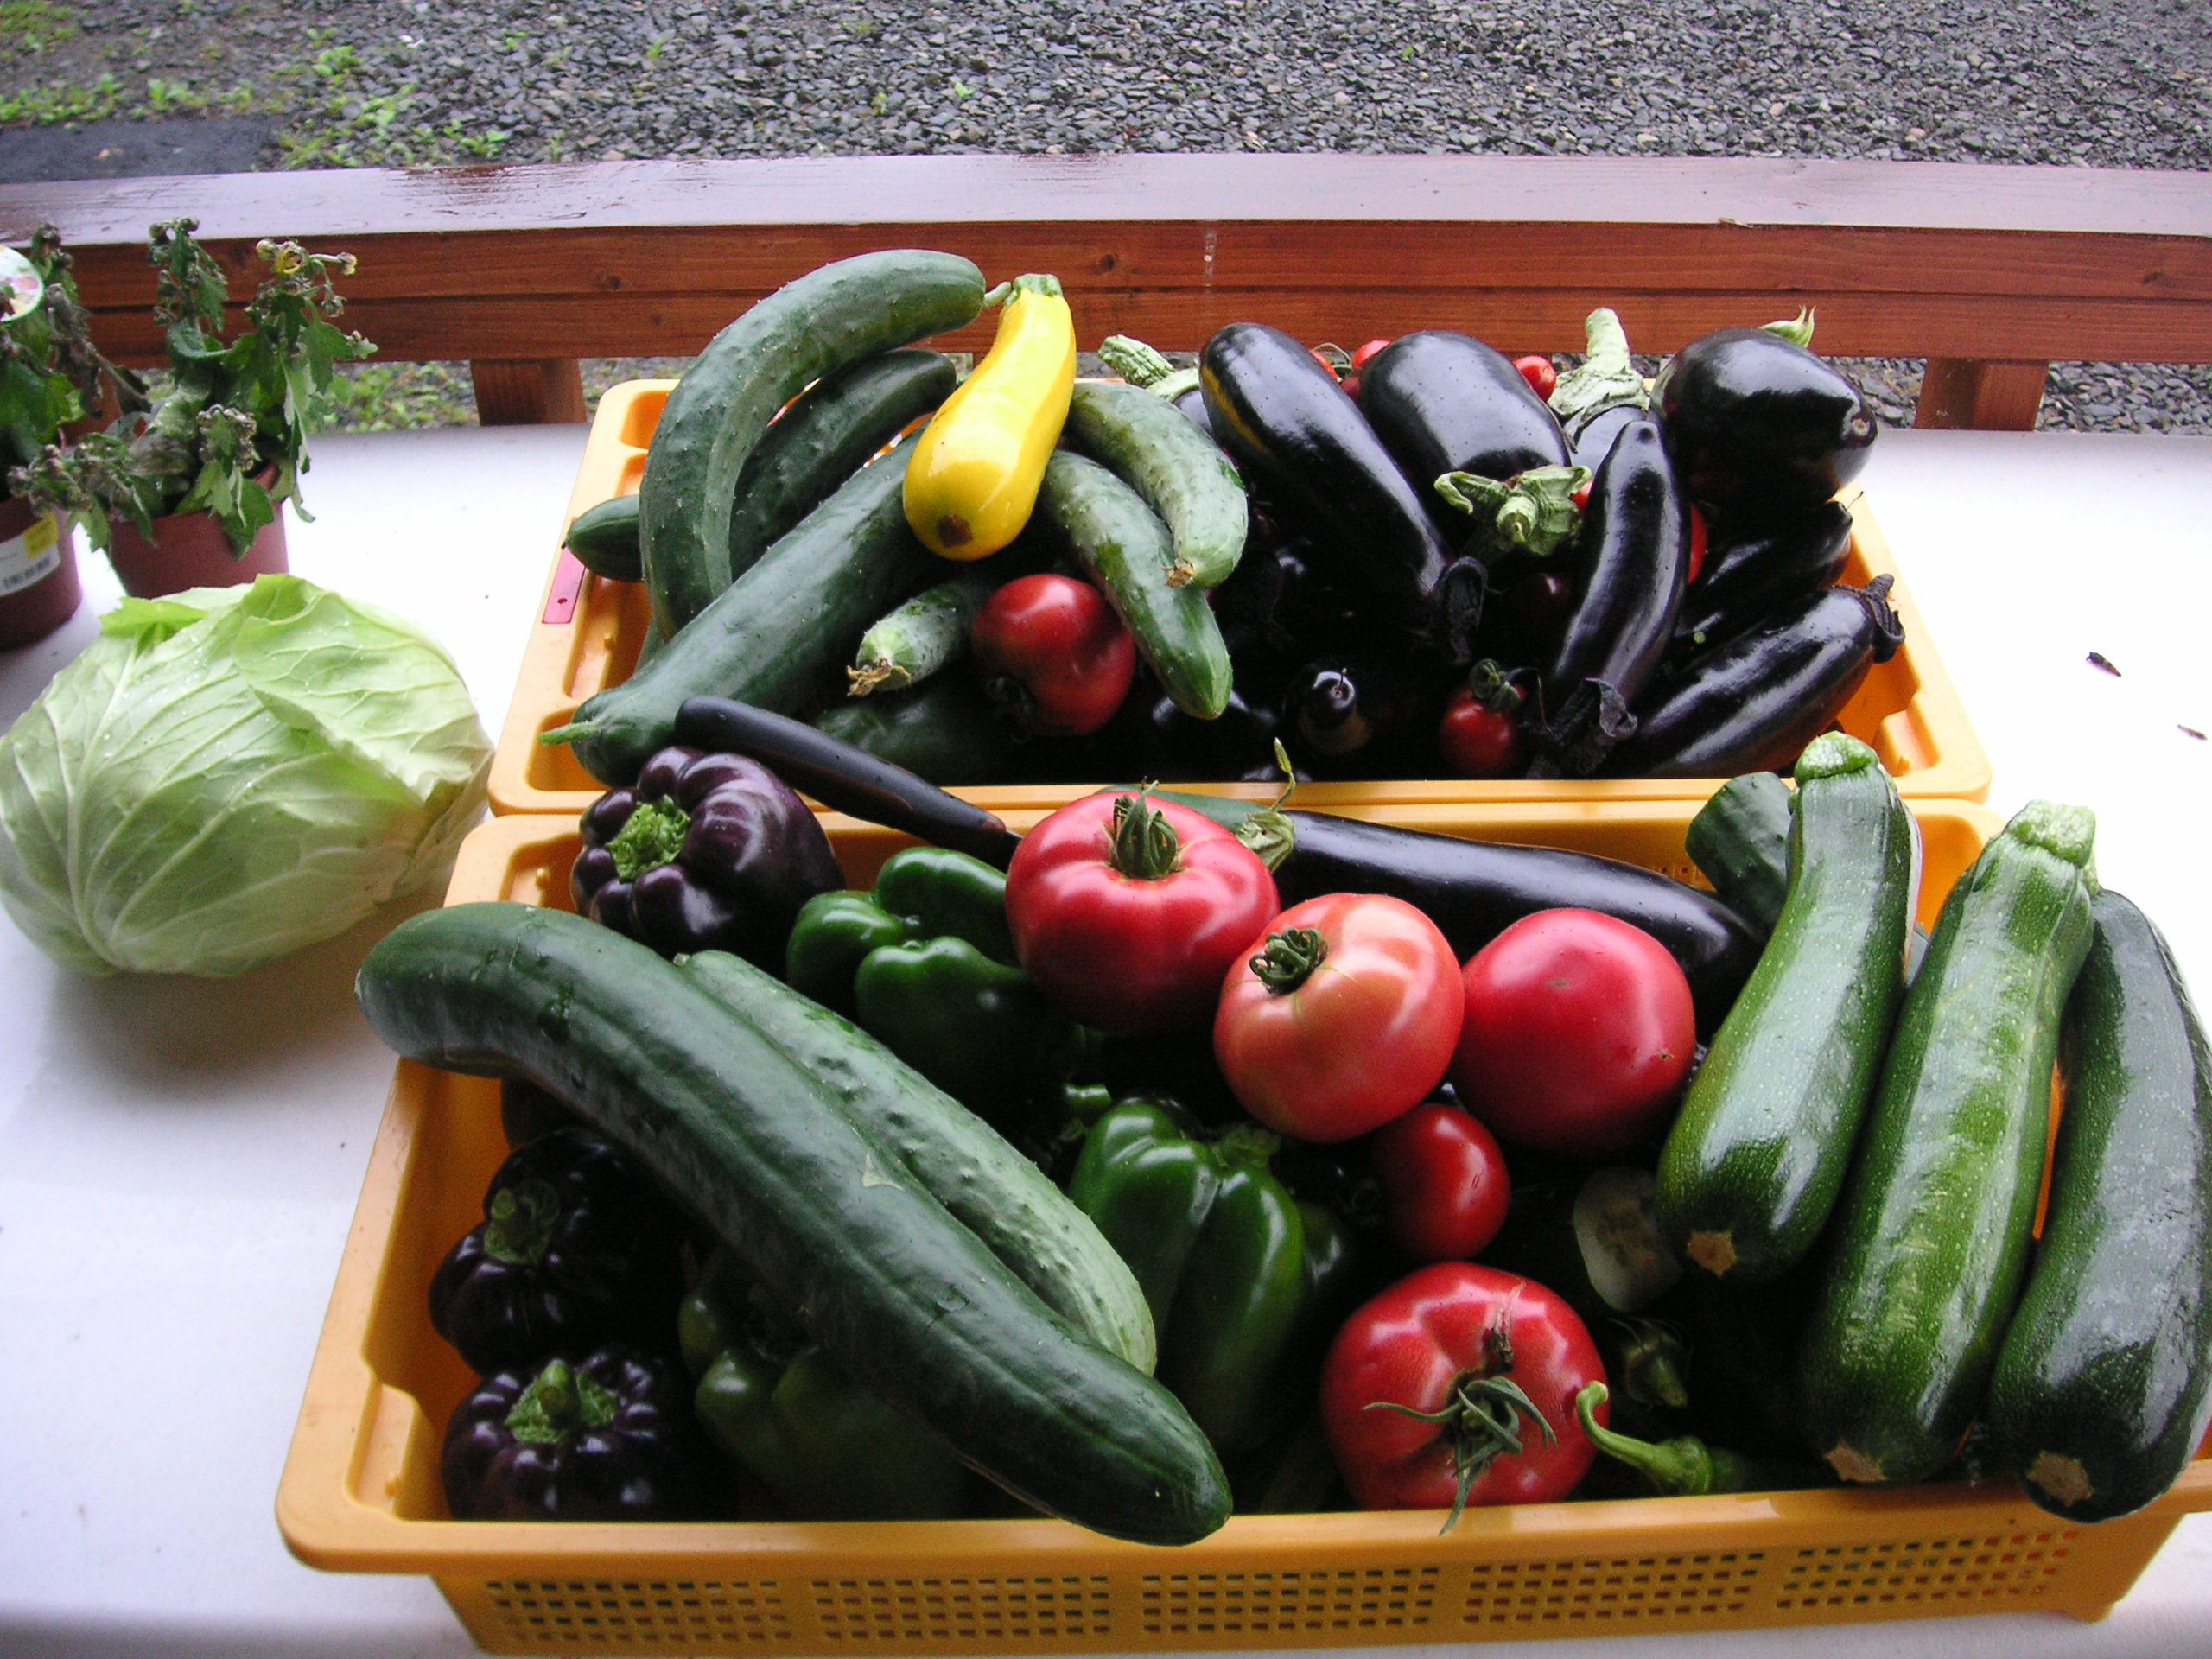 個別指導塾YSPの体験学習「収穫体験・大地の力に感動!」